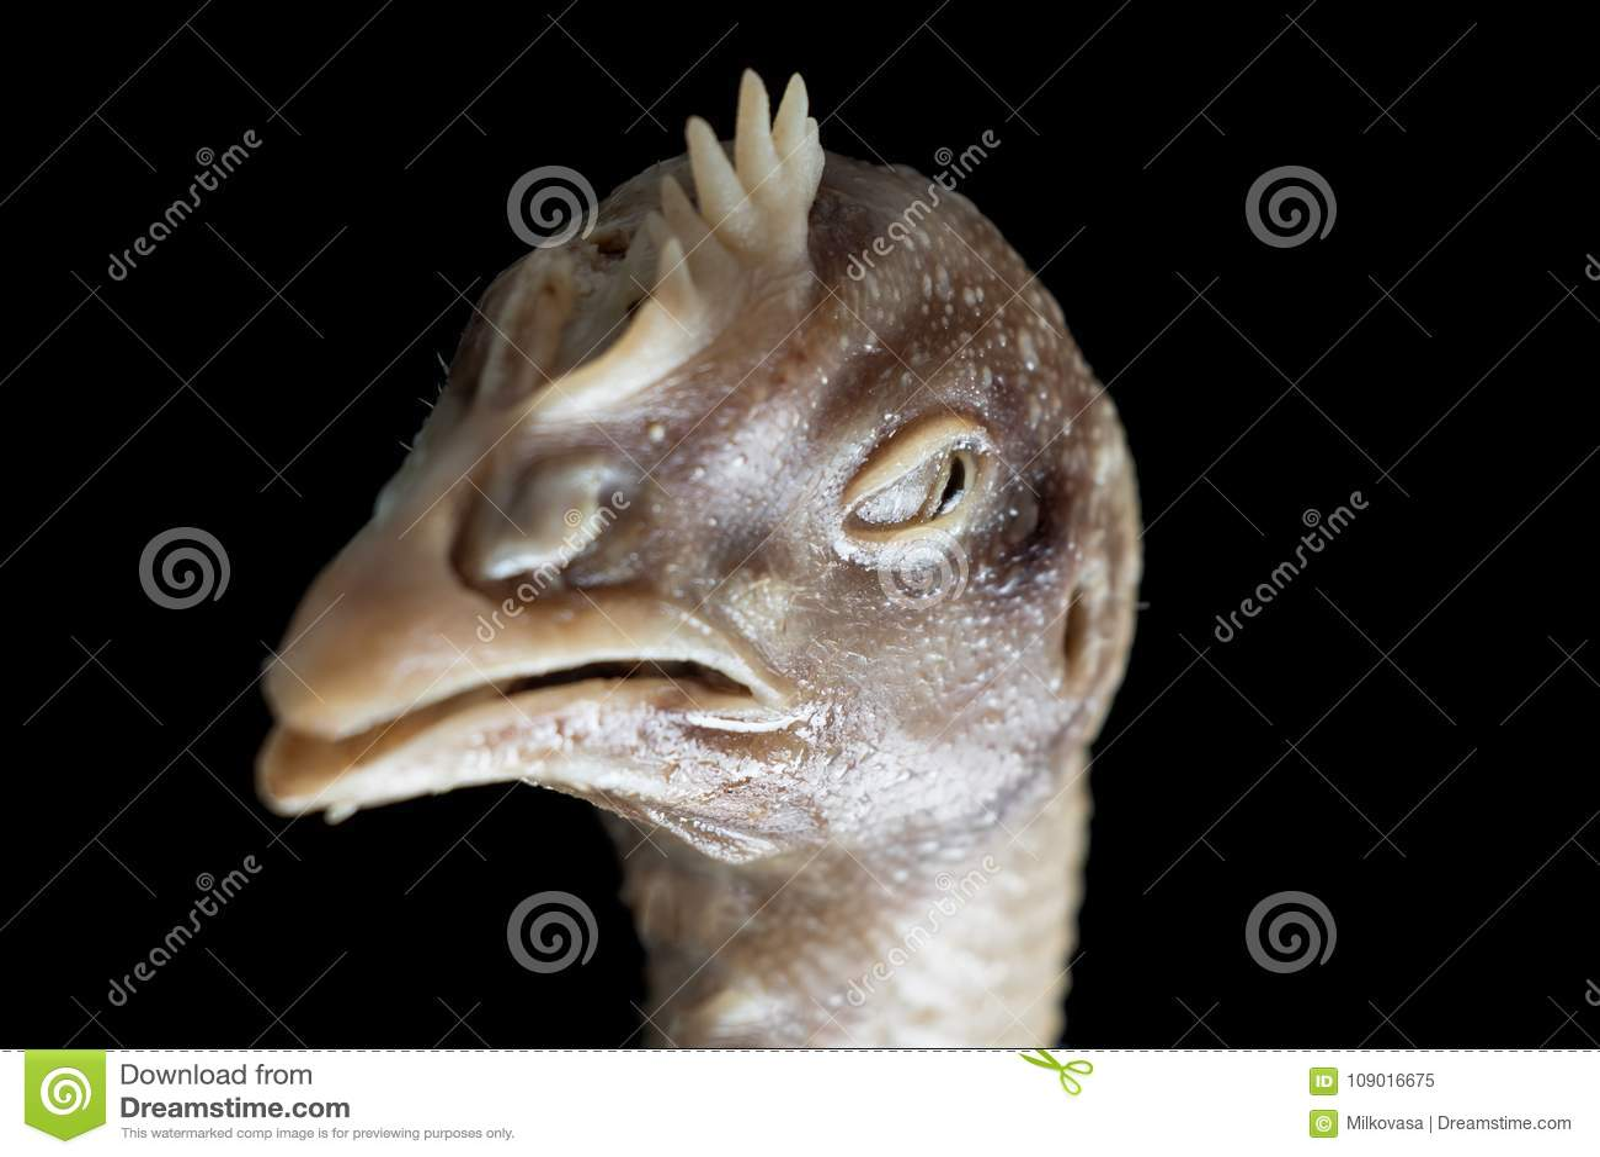 общипанная курица фото